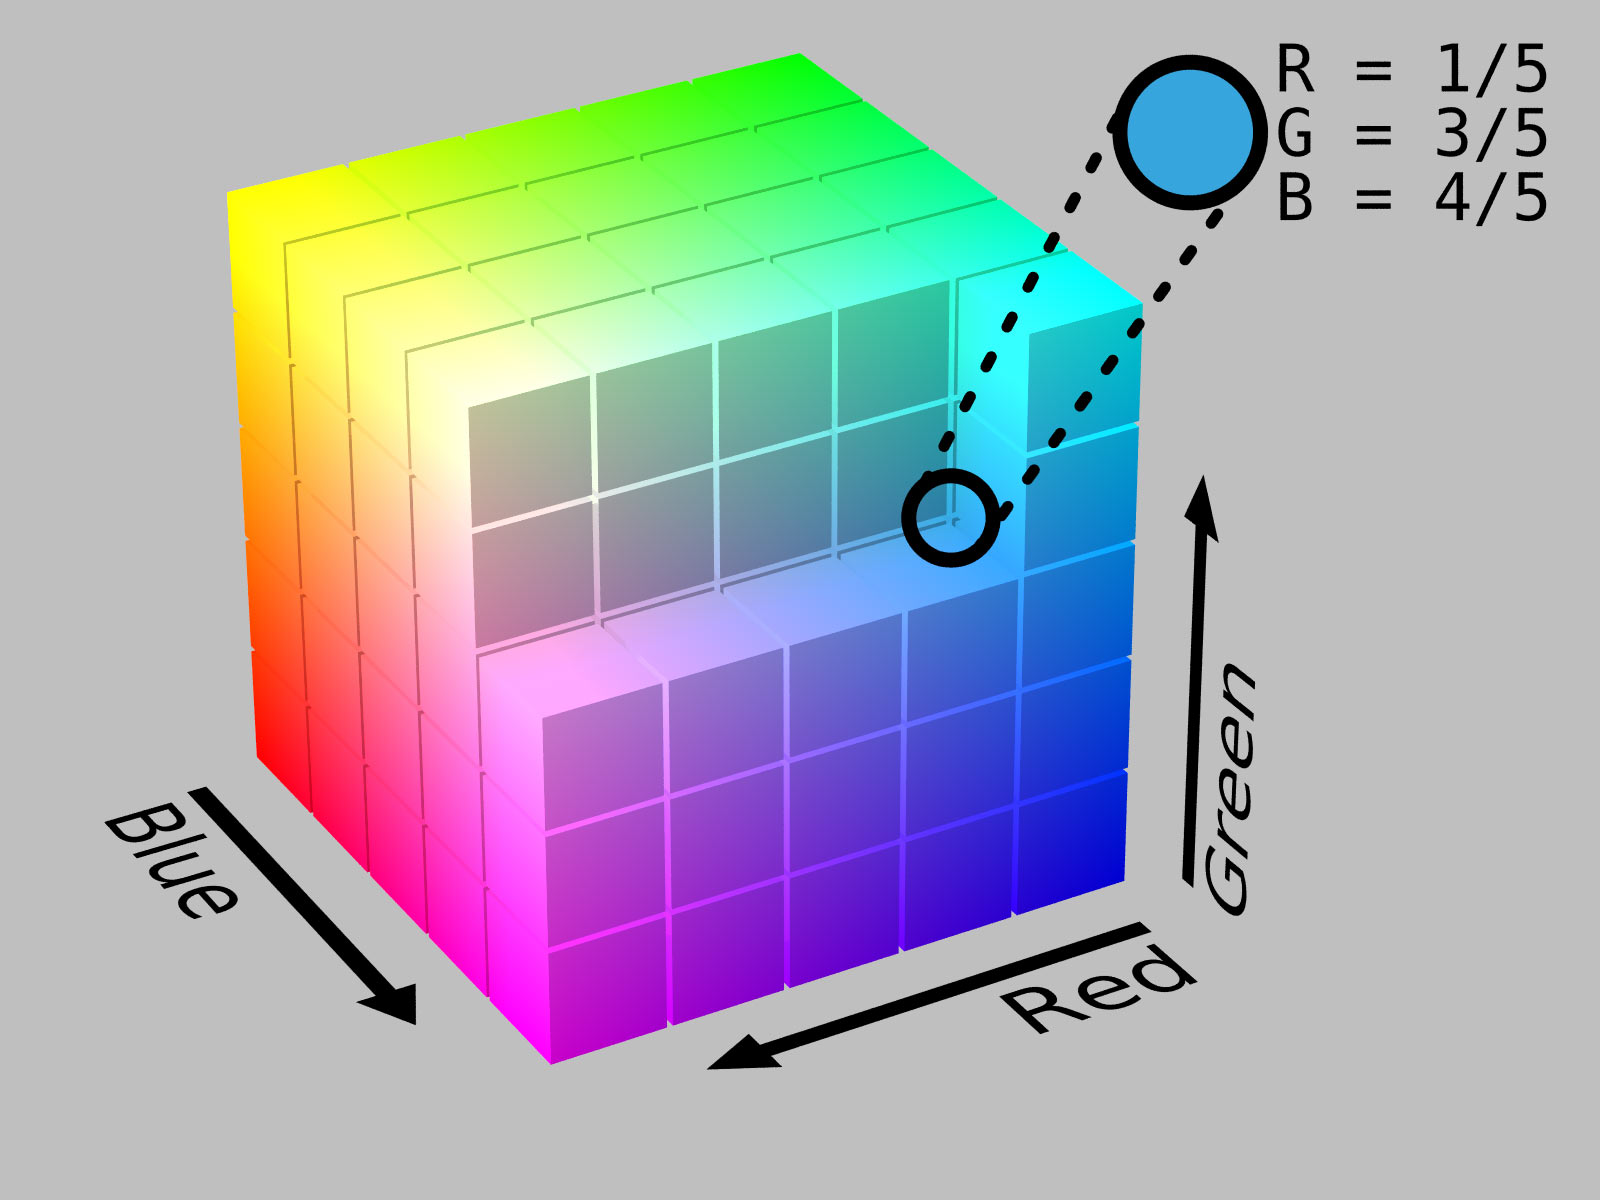 leds_RGB.jpg